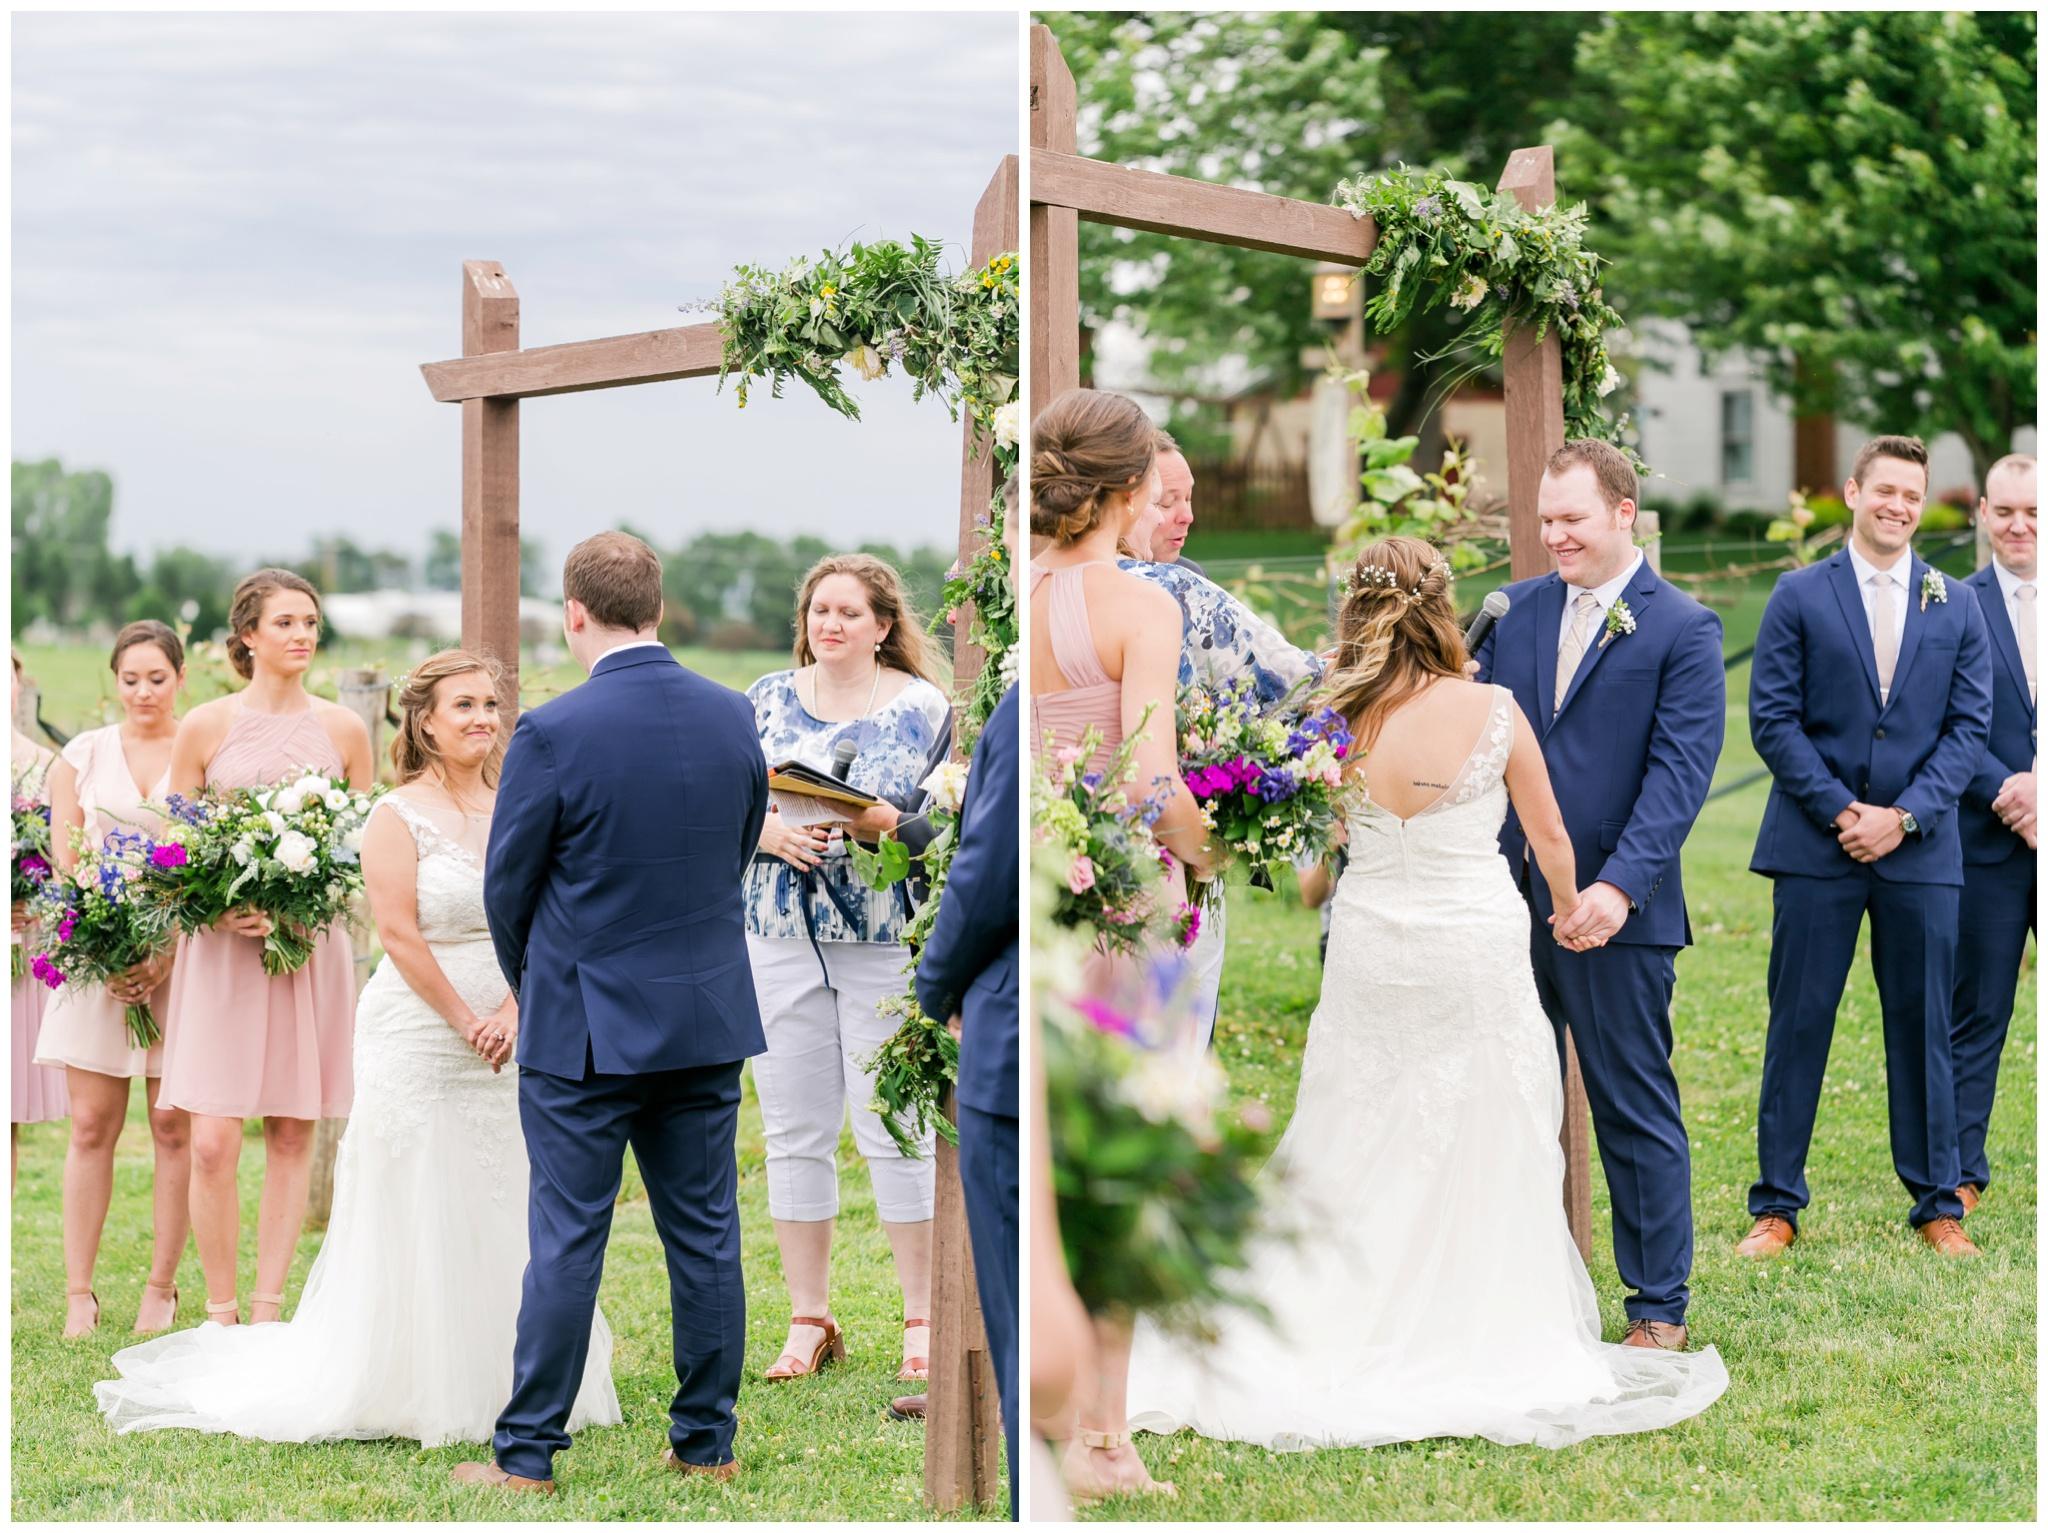 over_the_vines_wedding_edgerton_wisconsin_wedding_caynay_photo_4030.jpg